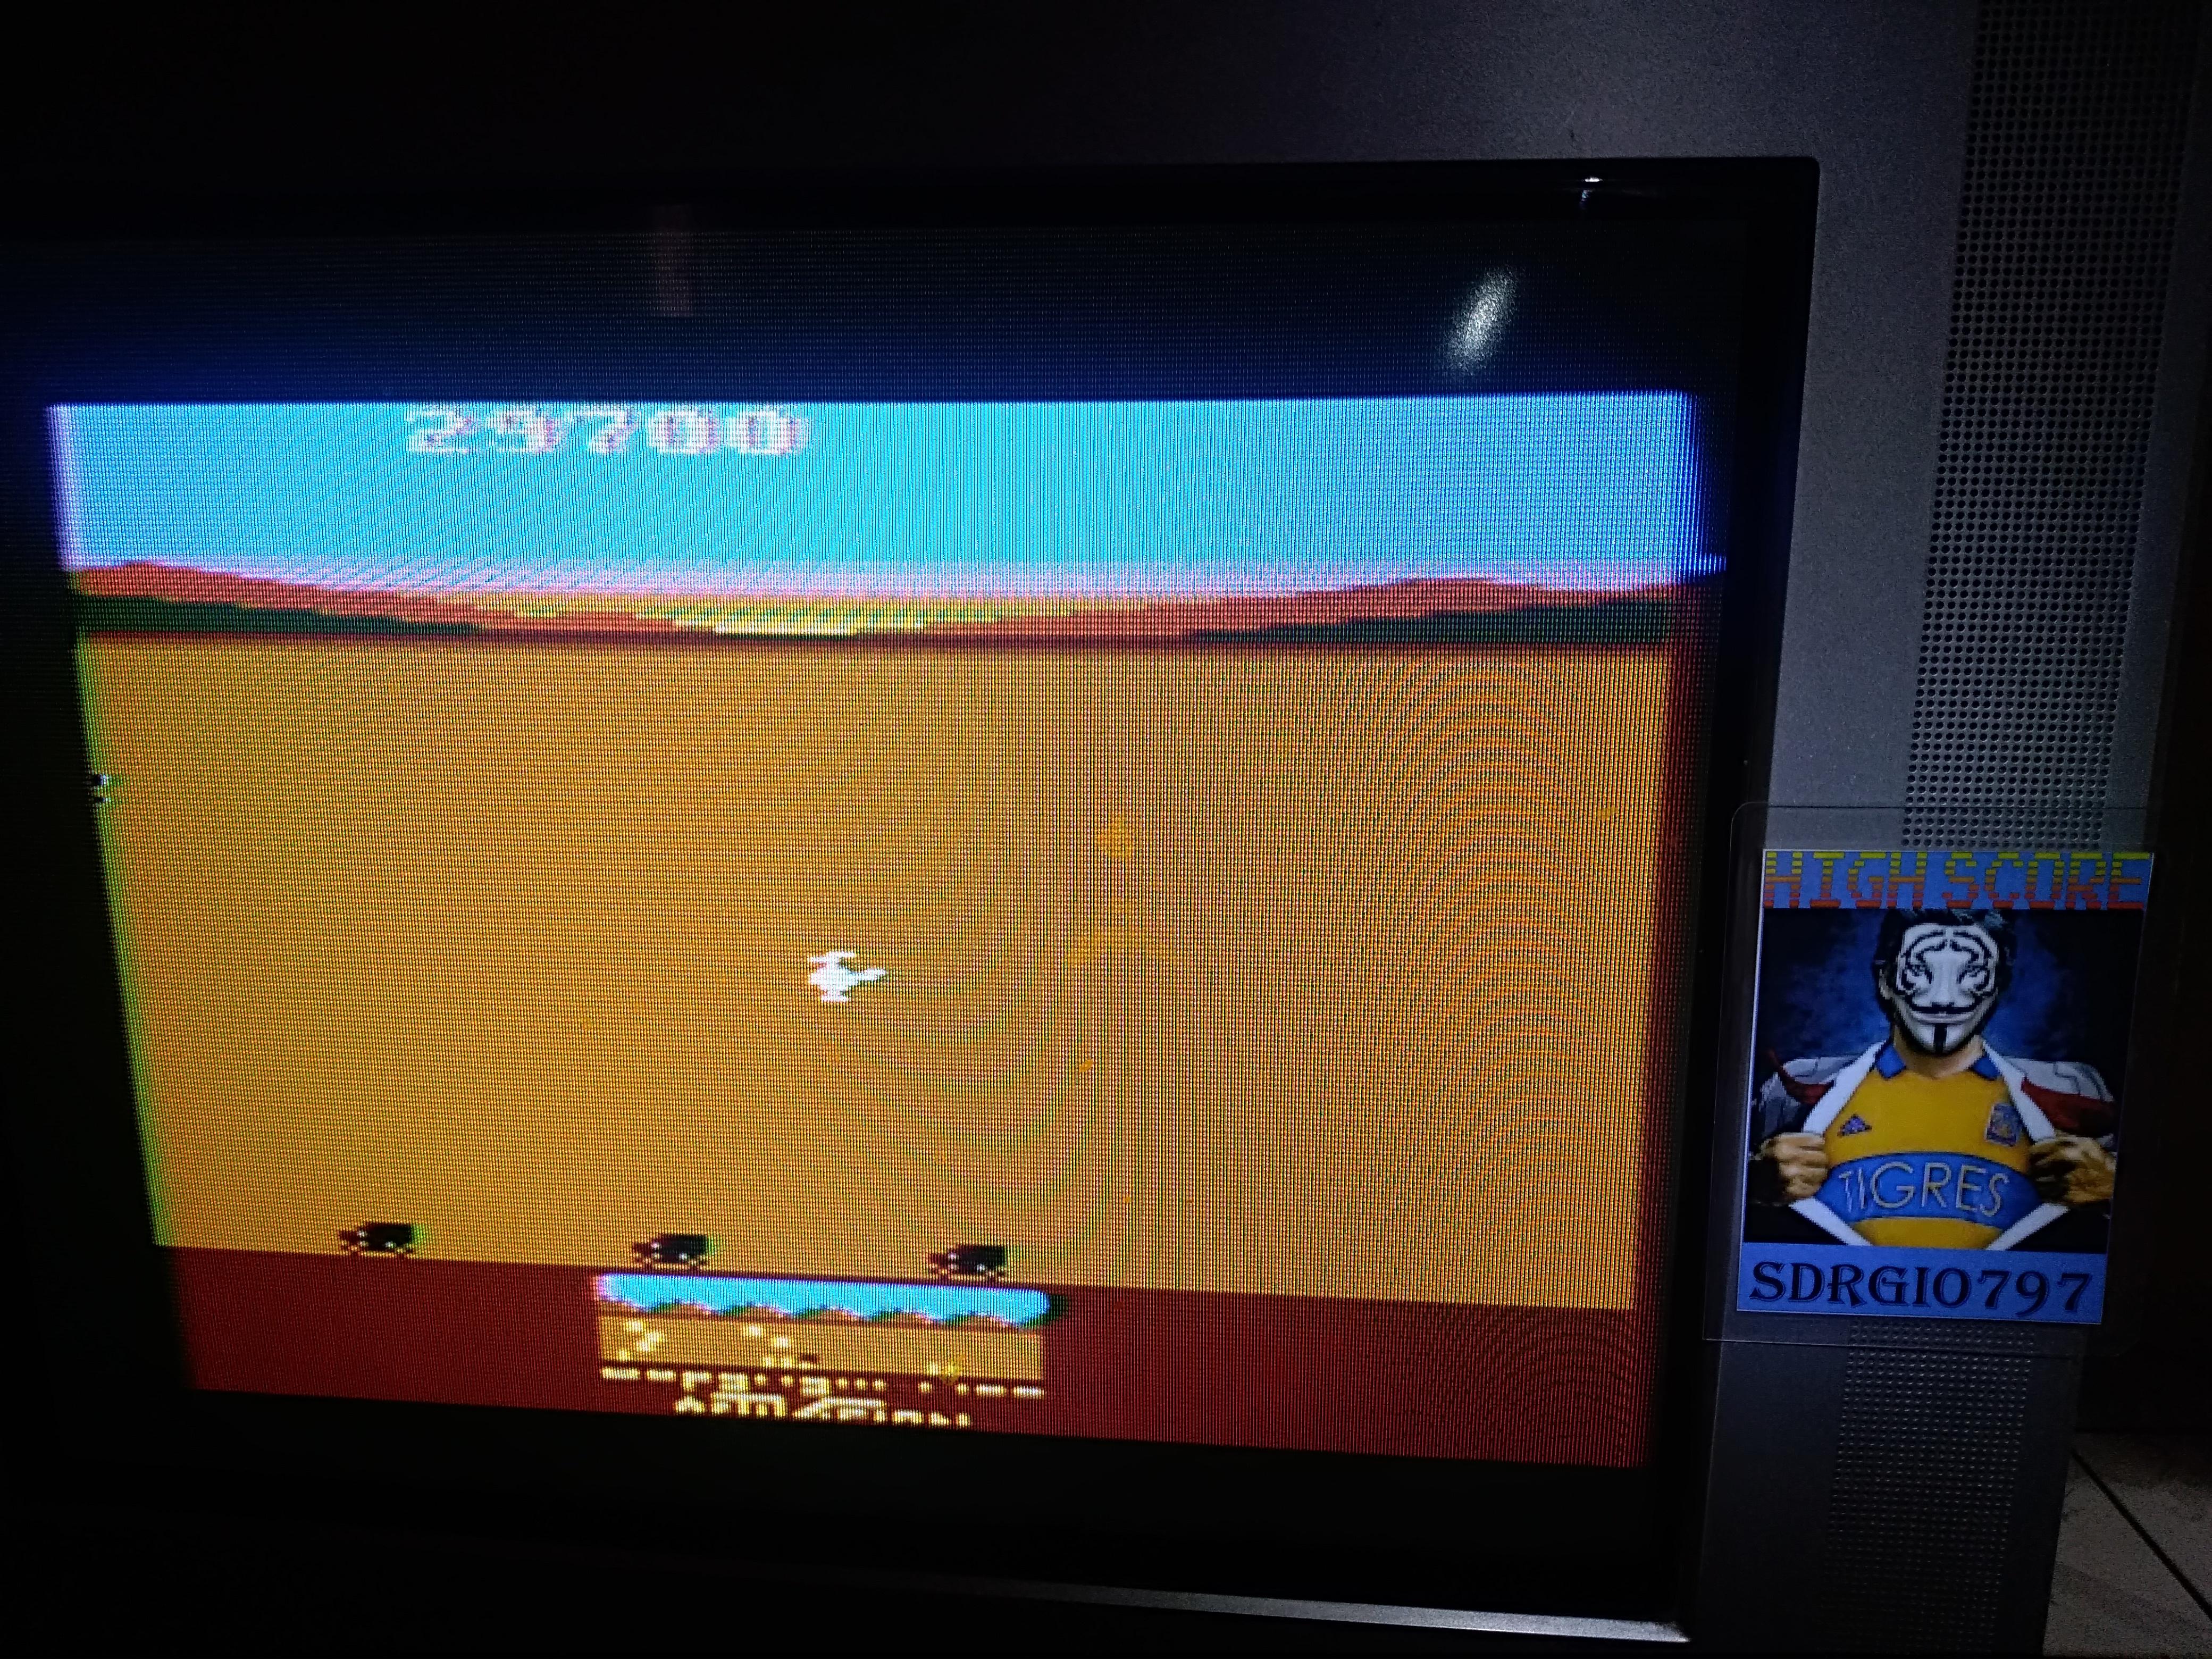 Sdrgio797: Chopper Command: Game 3 (Atari 2600 Novice/B) 29,700 points on 2020-08-12 16:11:15